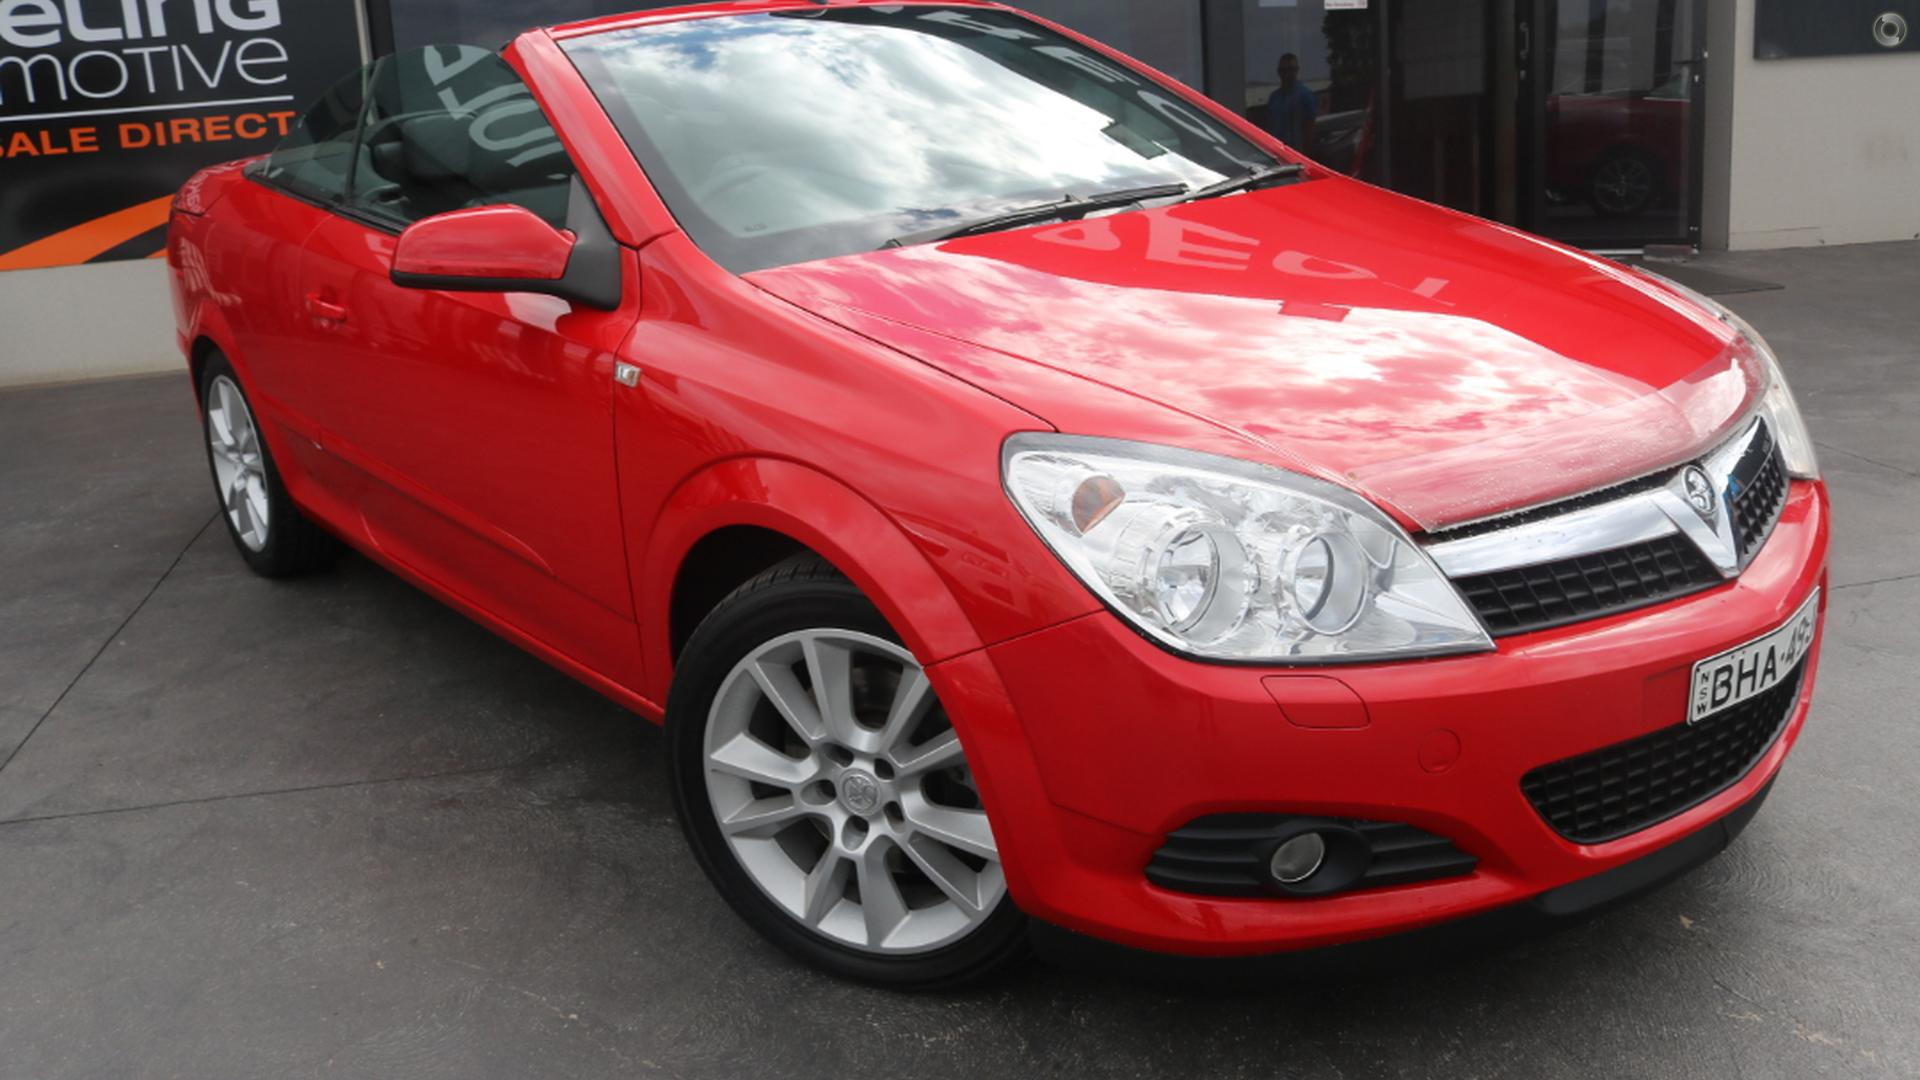 2008 Holden Astra Twin Top Ah Wakeling Automotive